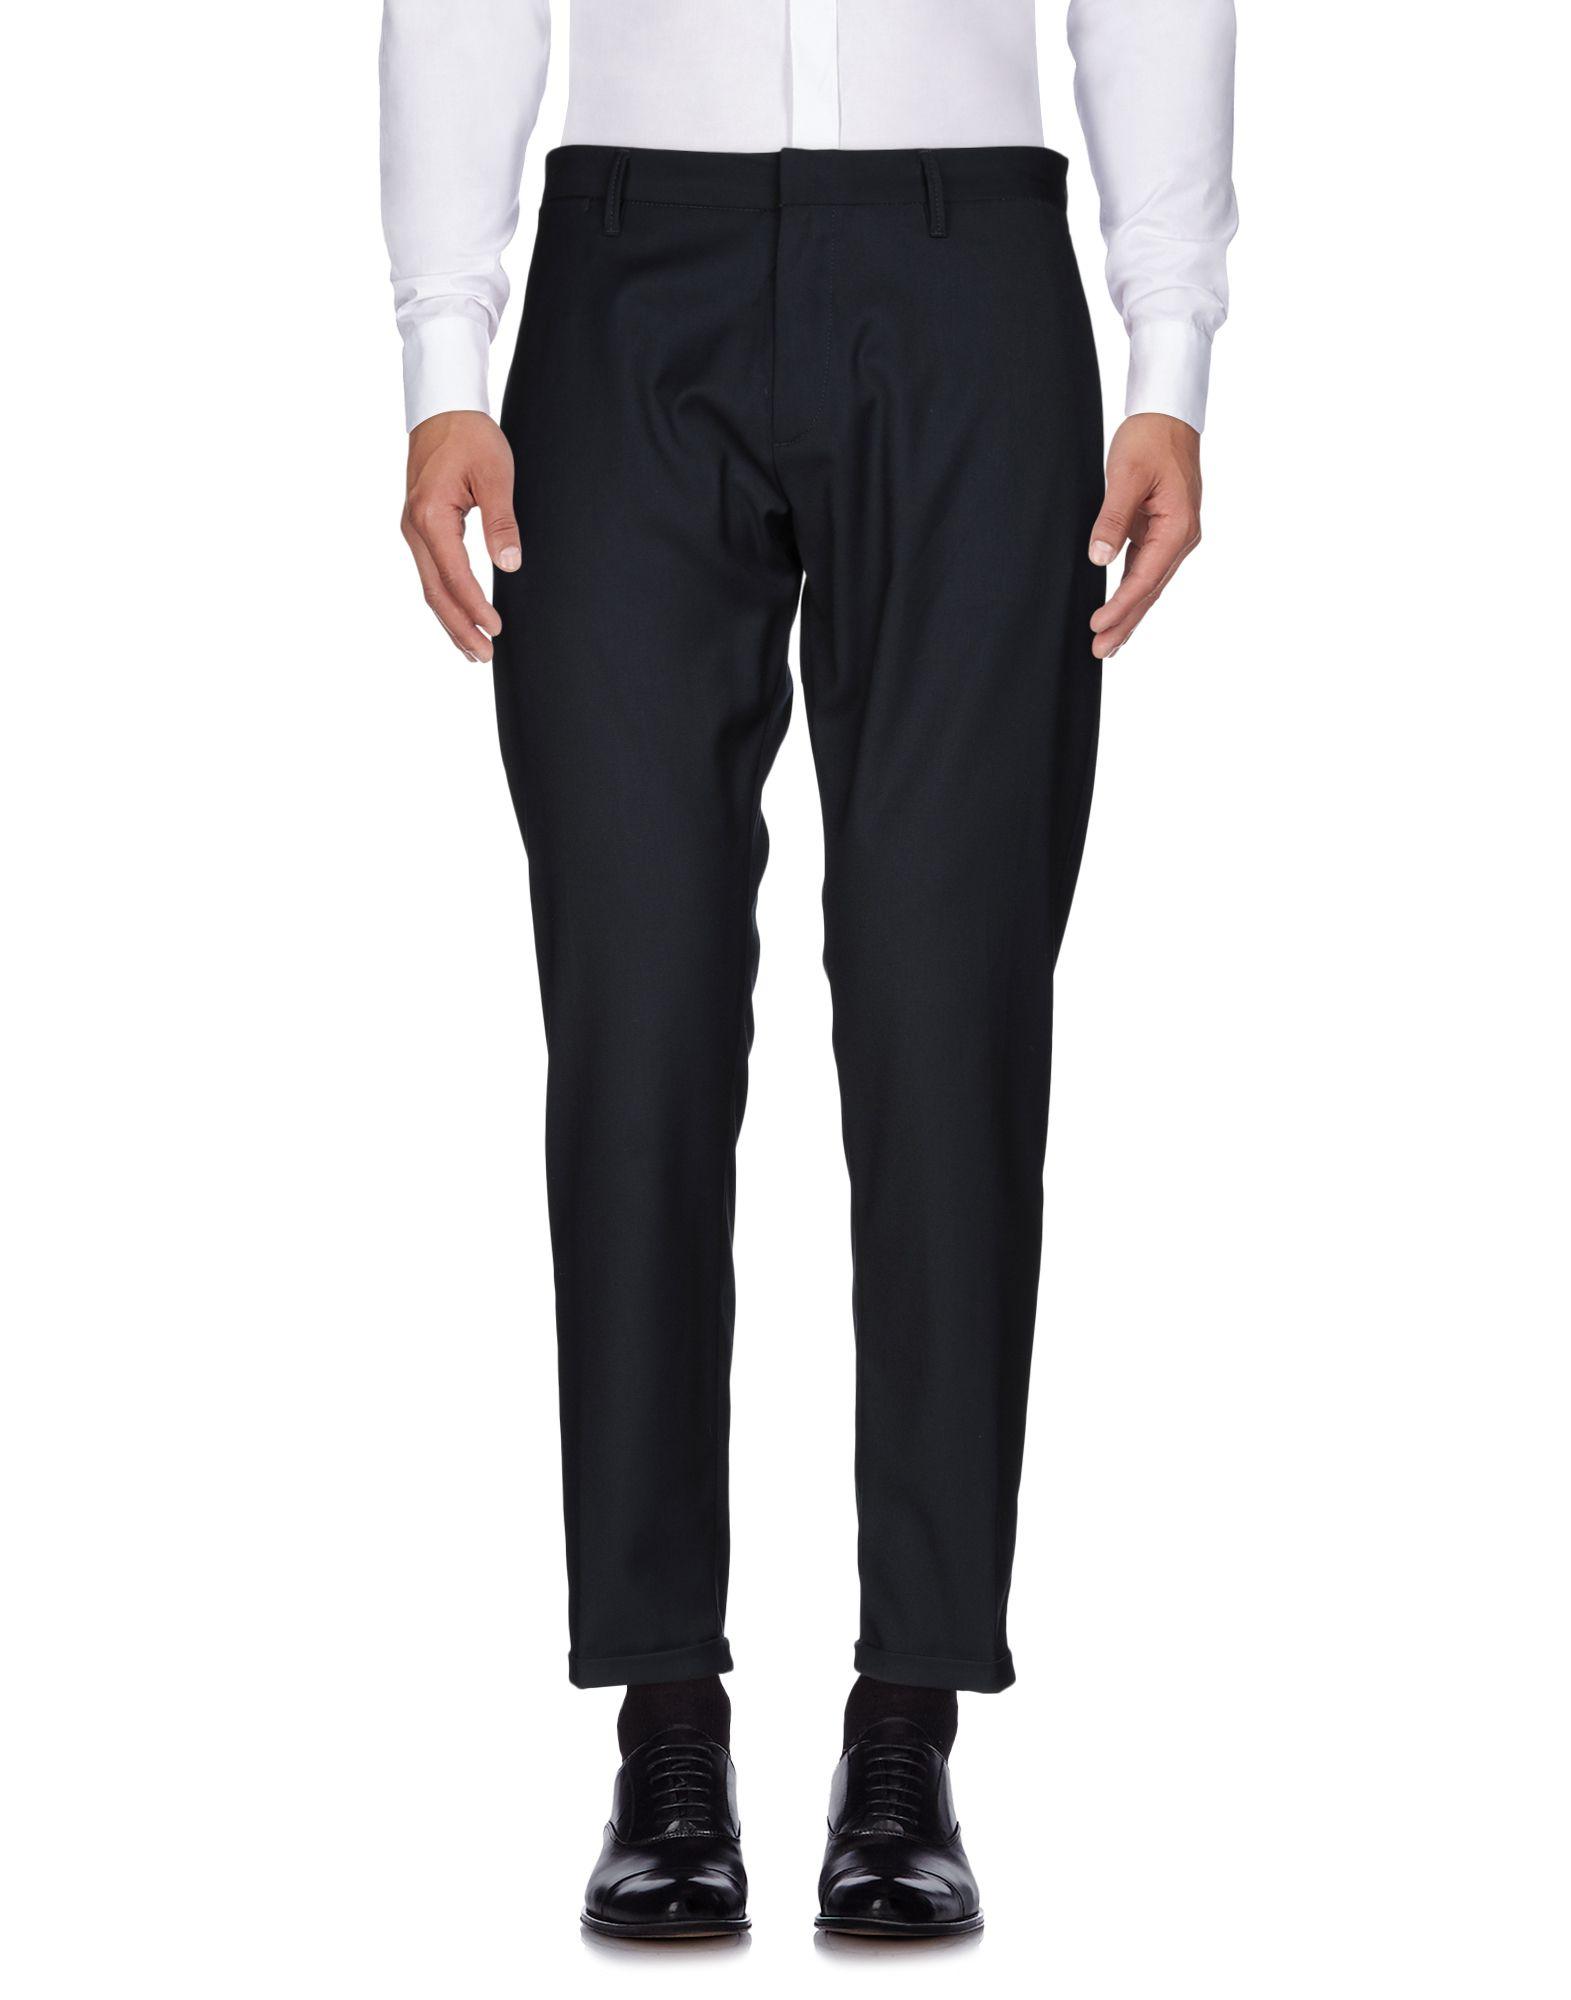 Pantalone - Officina 36 Uomo - Pantalone 13219384DX 745984